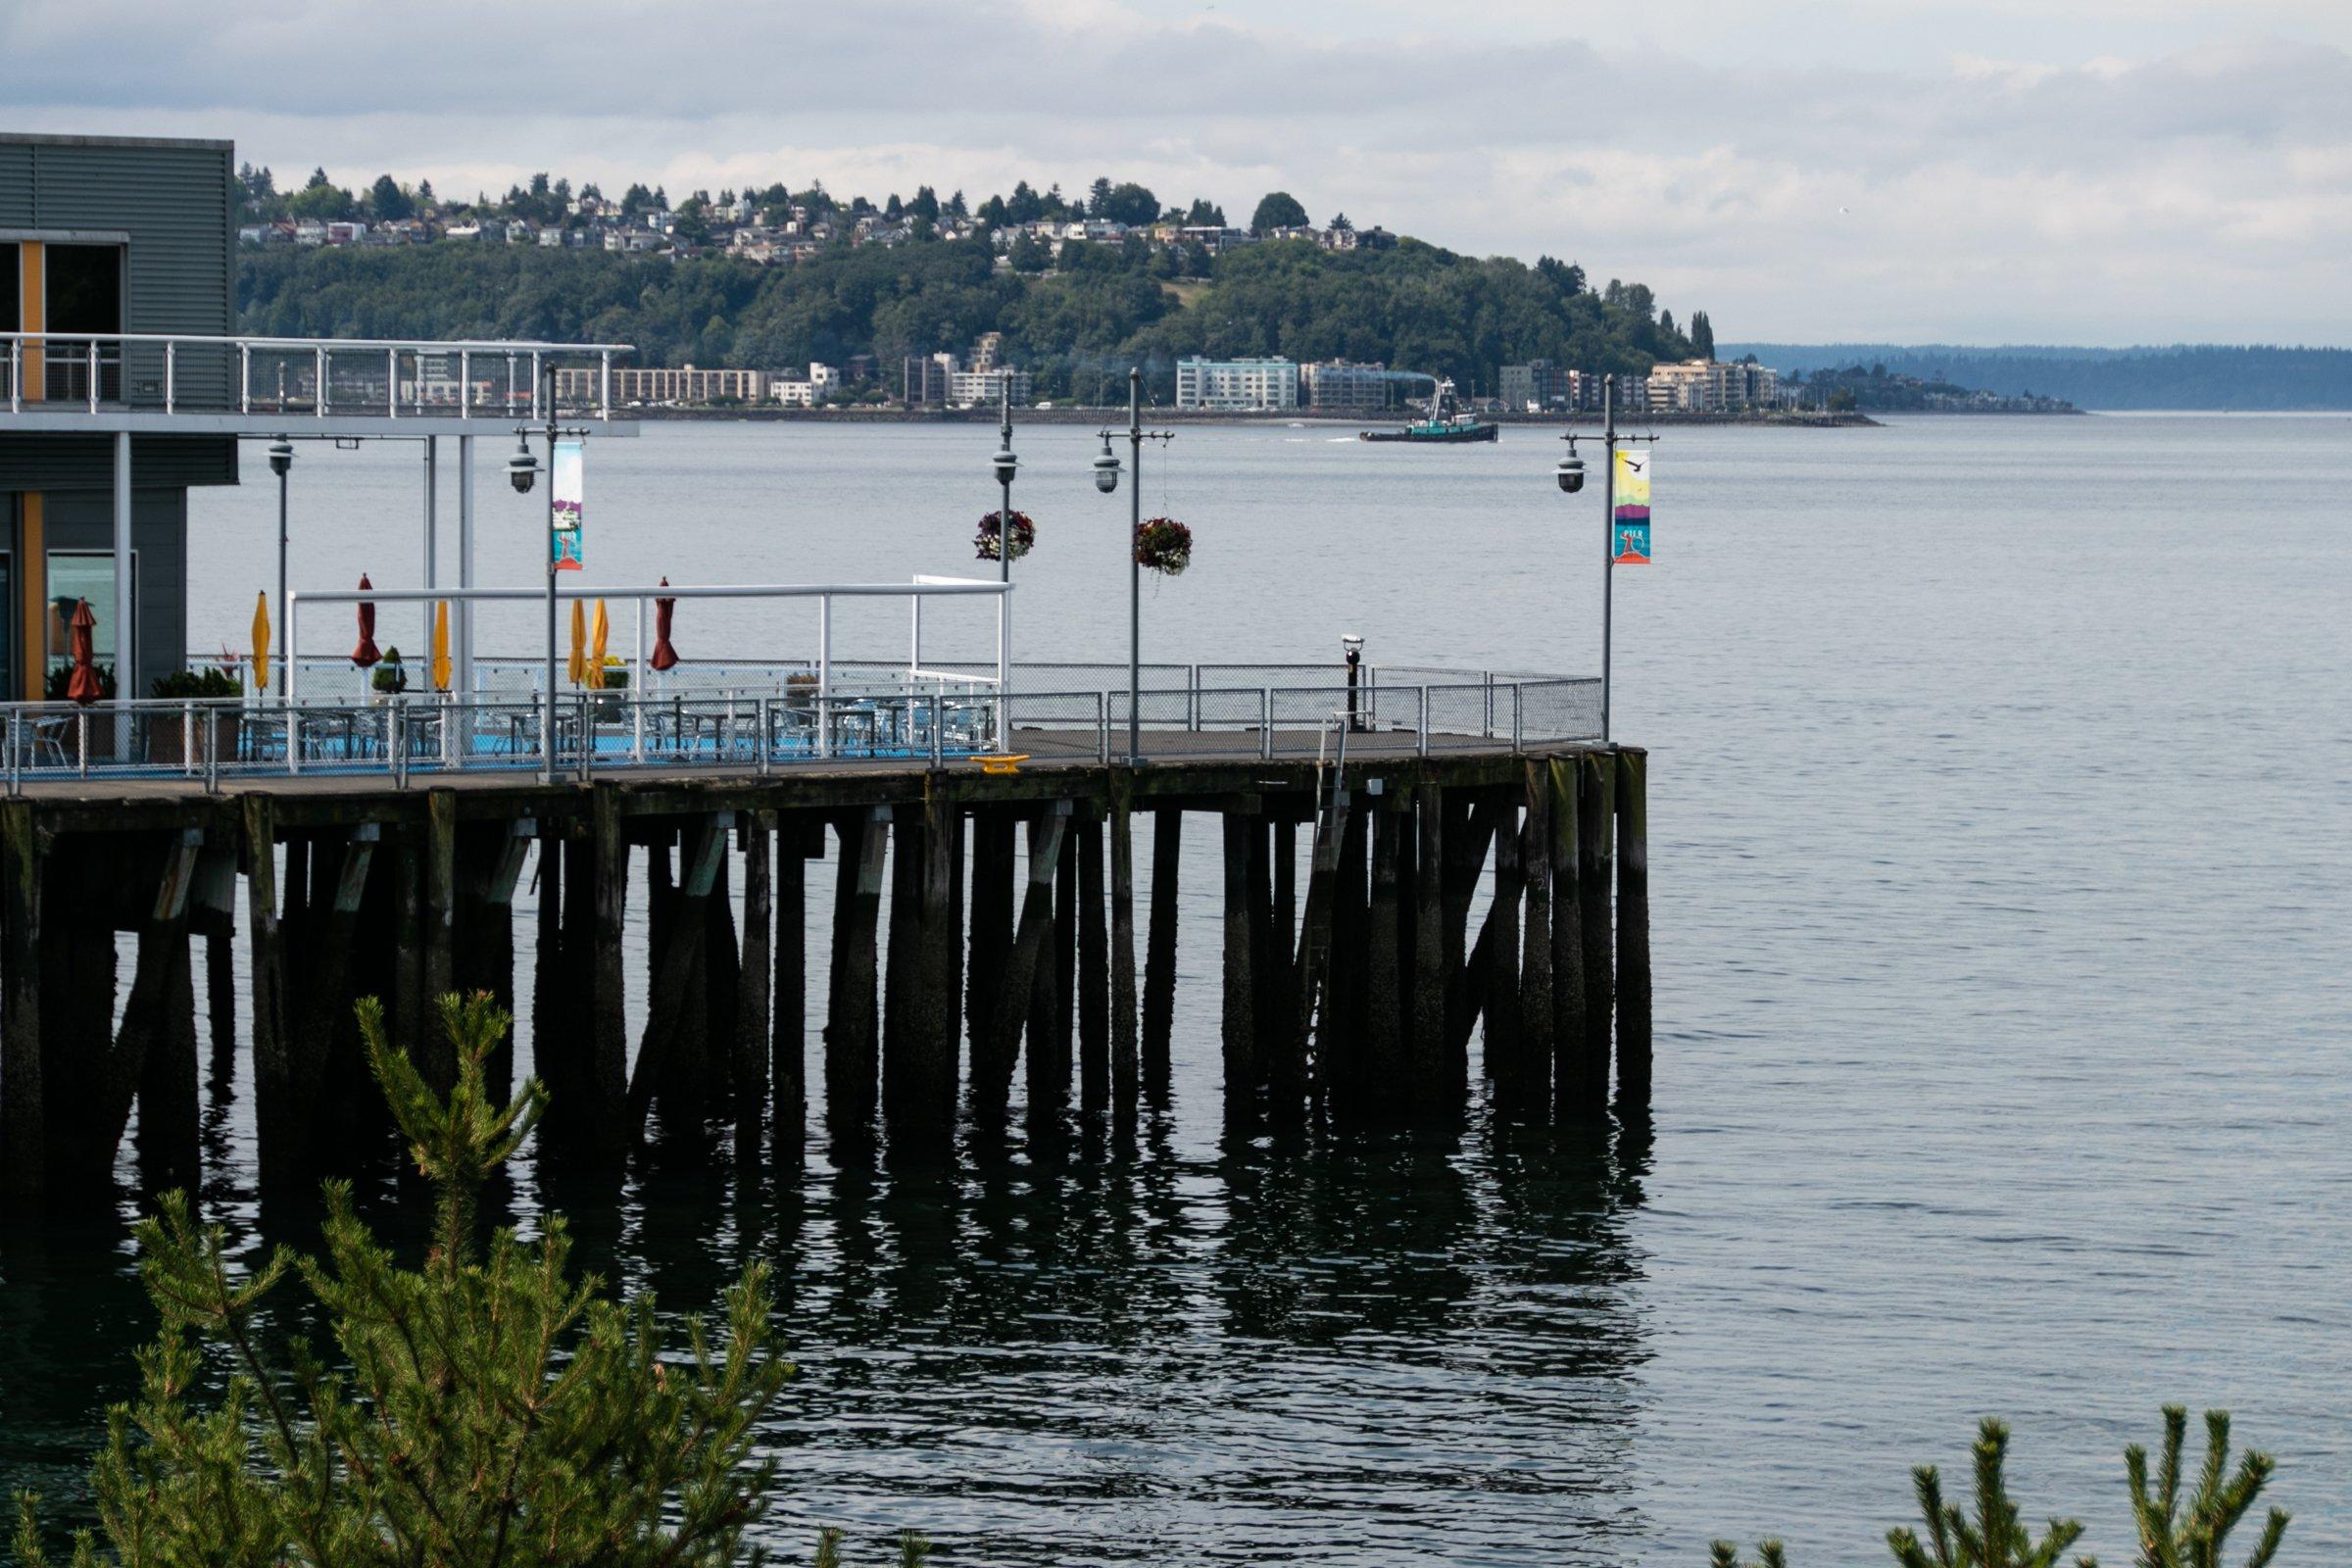 Wooden Pier Of Seaside Restaurant